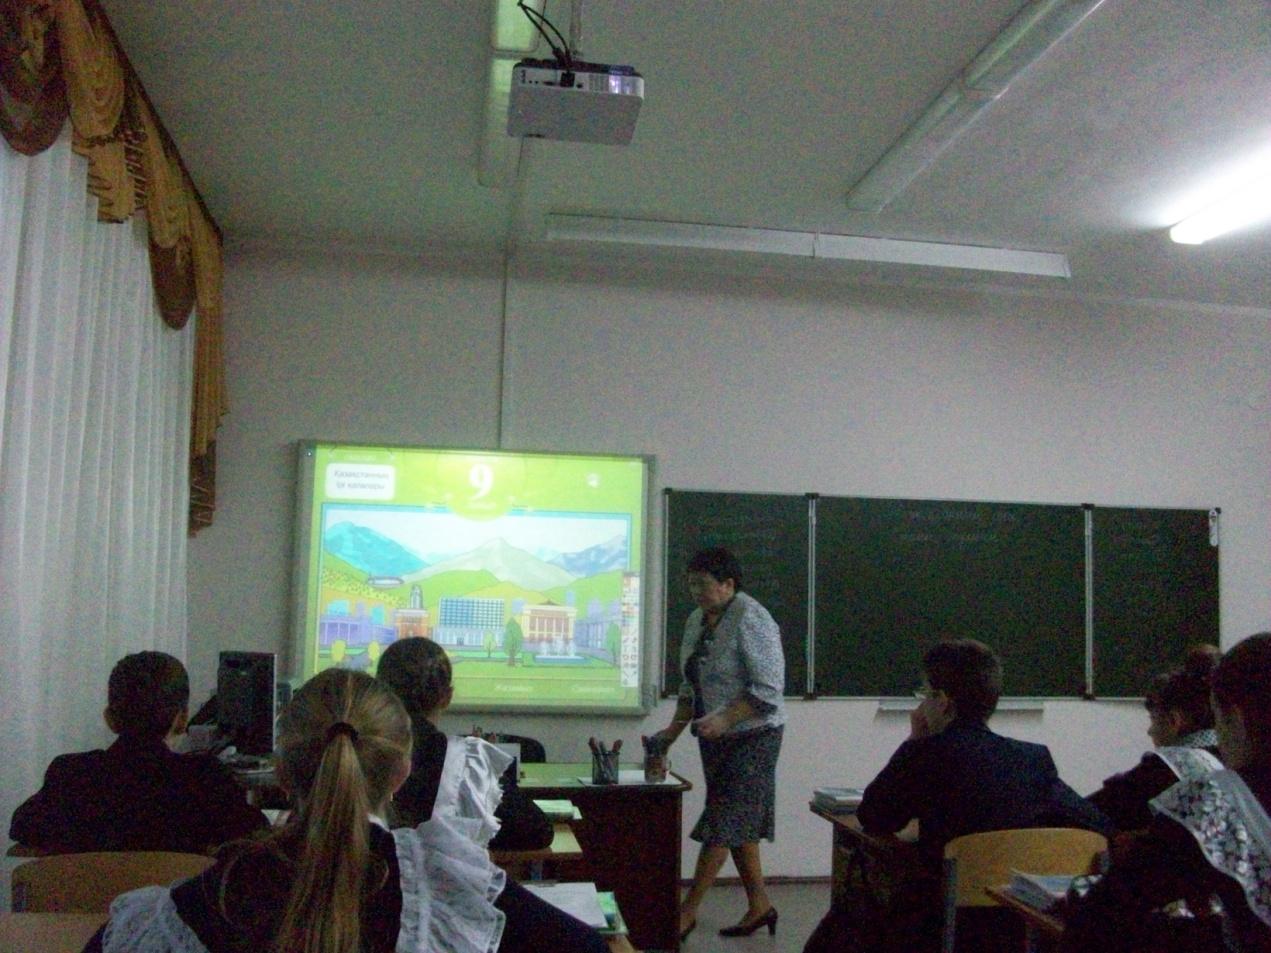 E:\Foto\Школа\урок открытый\102_6532.JPG